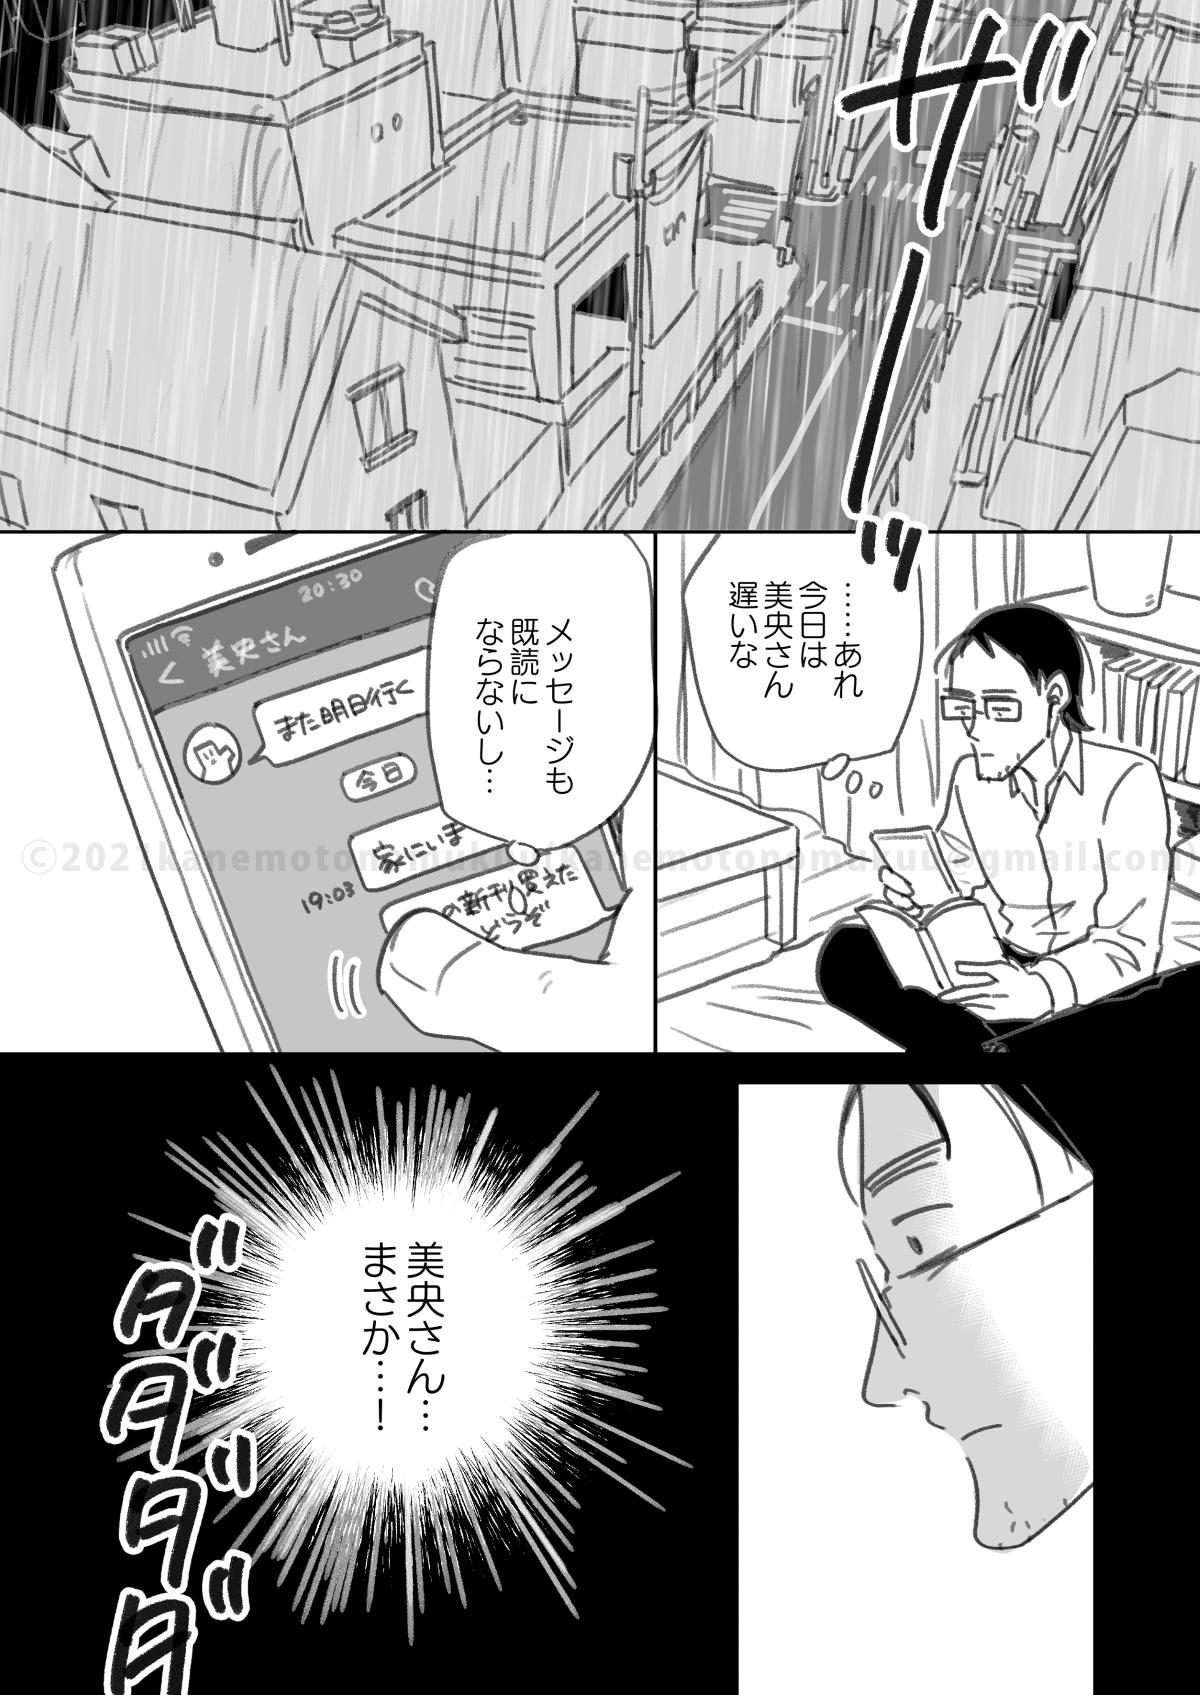 f:id:kanemotonomukuu:20210118100130j:plain